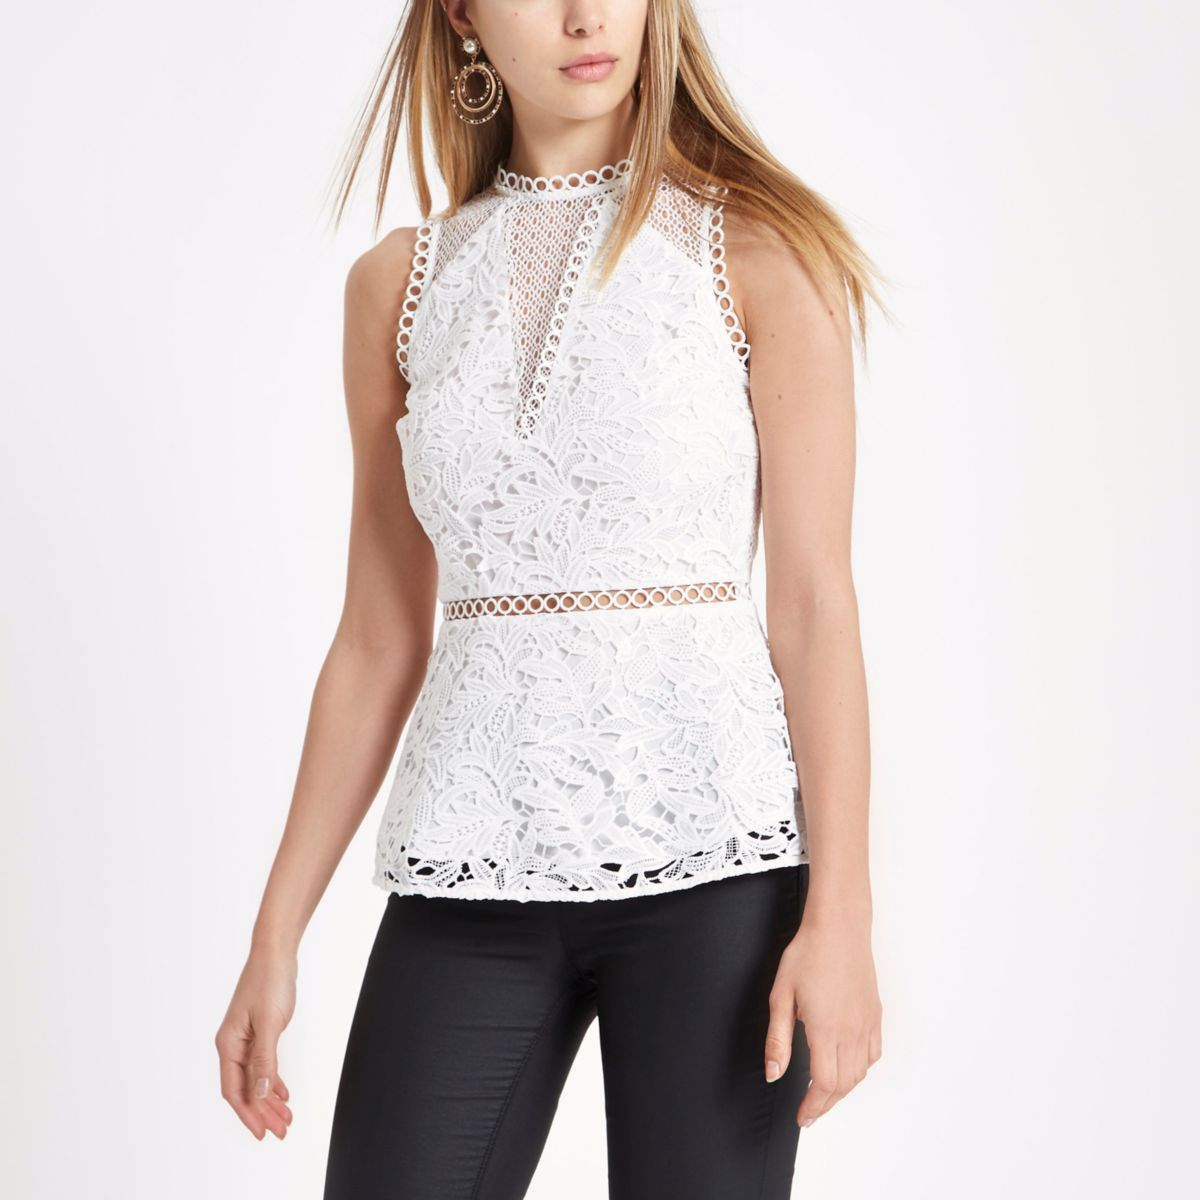 White lace sleeveless peplum top